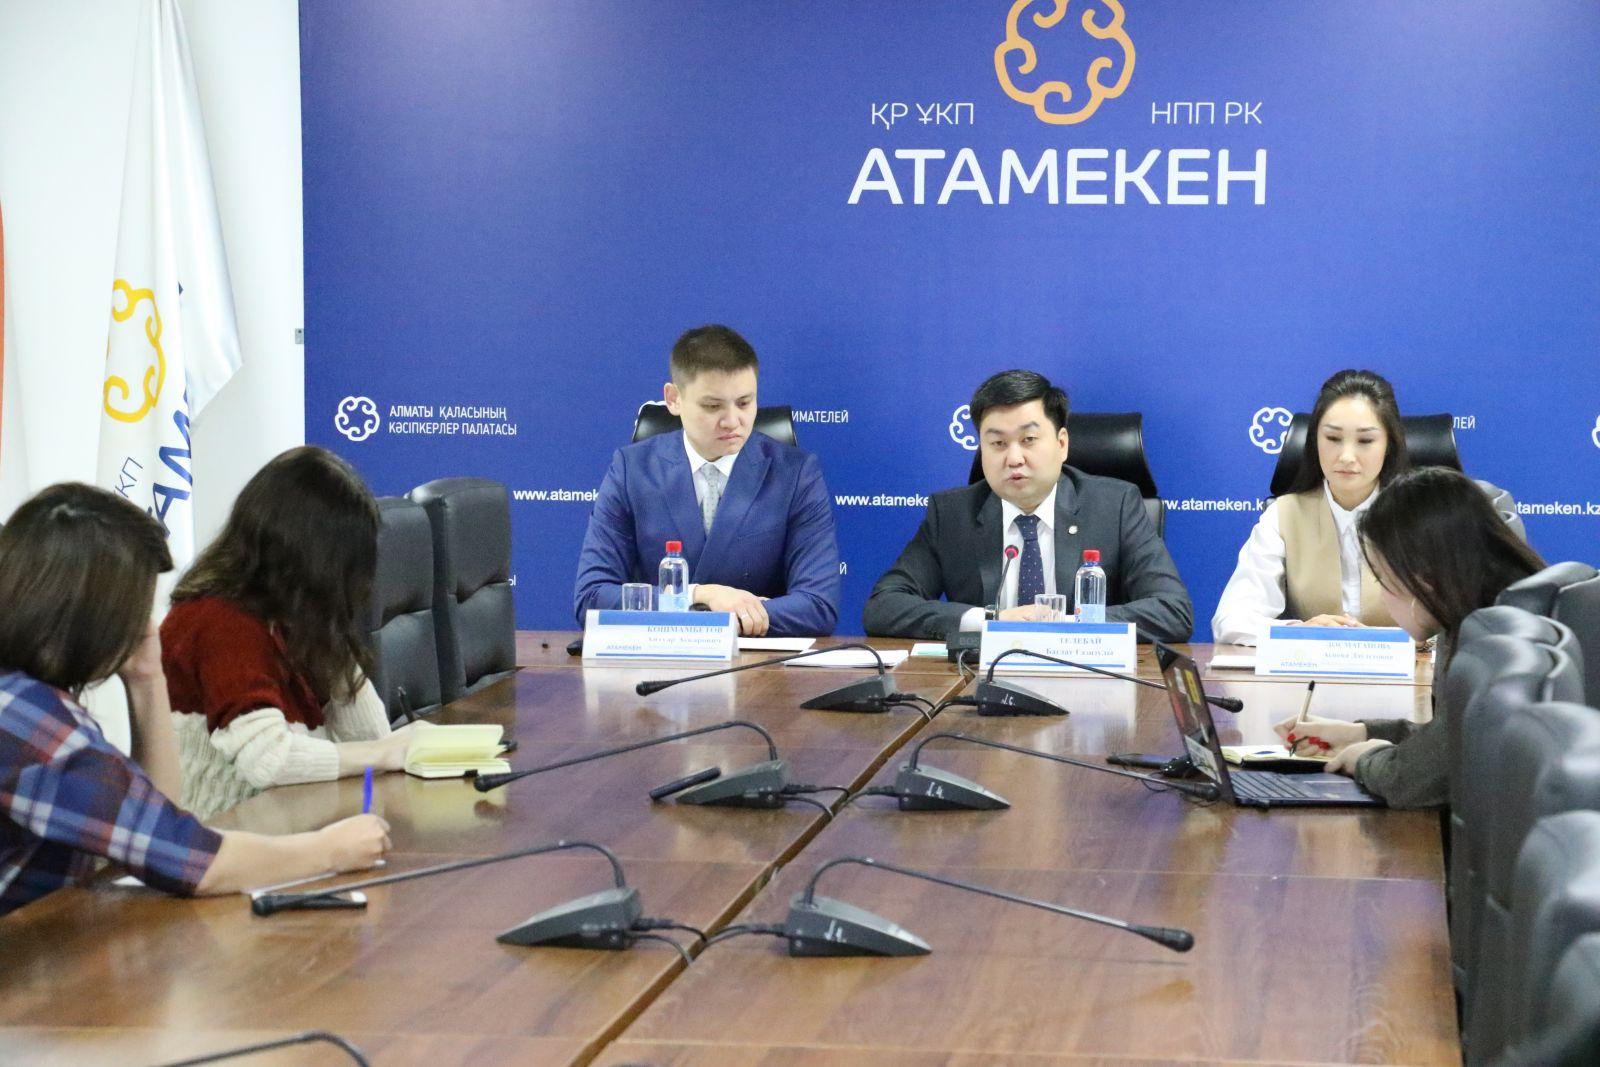 Как будет меняться бизнес Алматы в 2019 году    , бизнес , Алматы,  НПП РК «Атамекен»